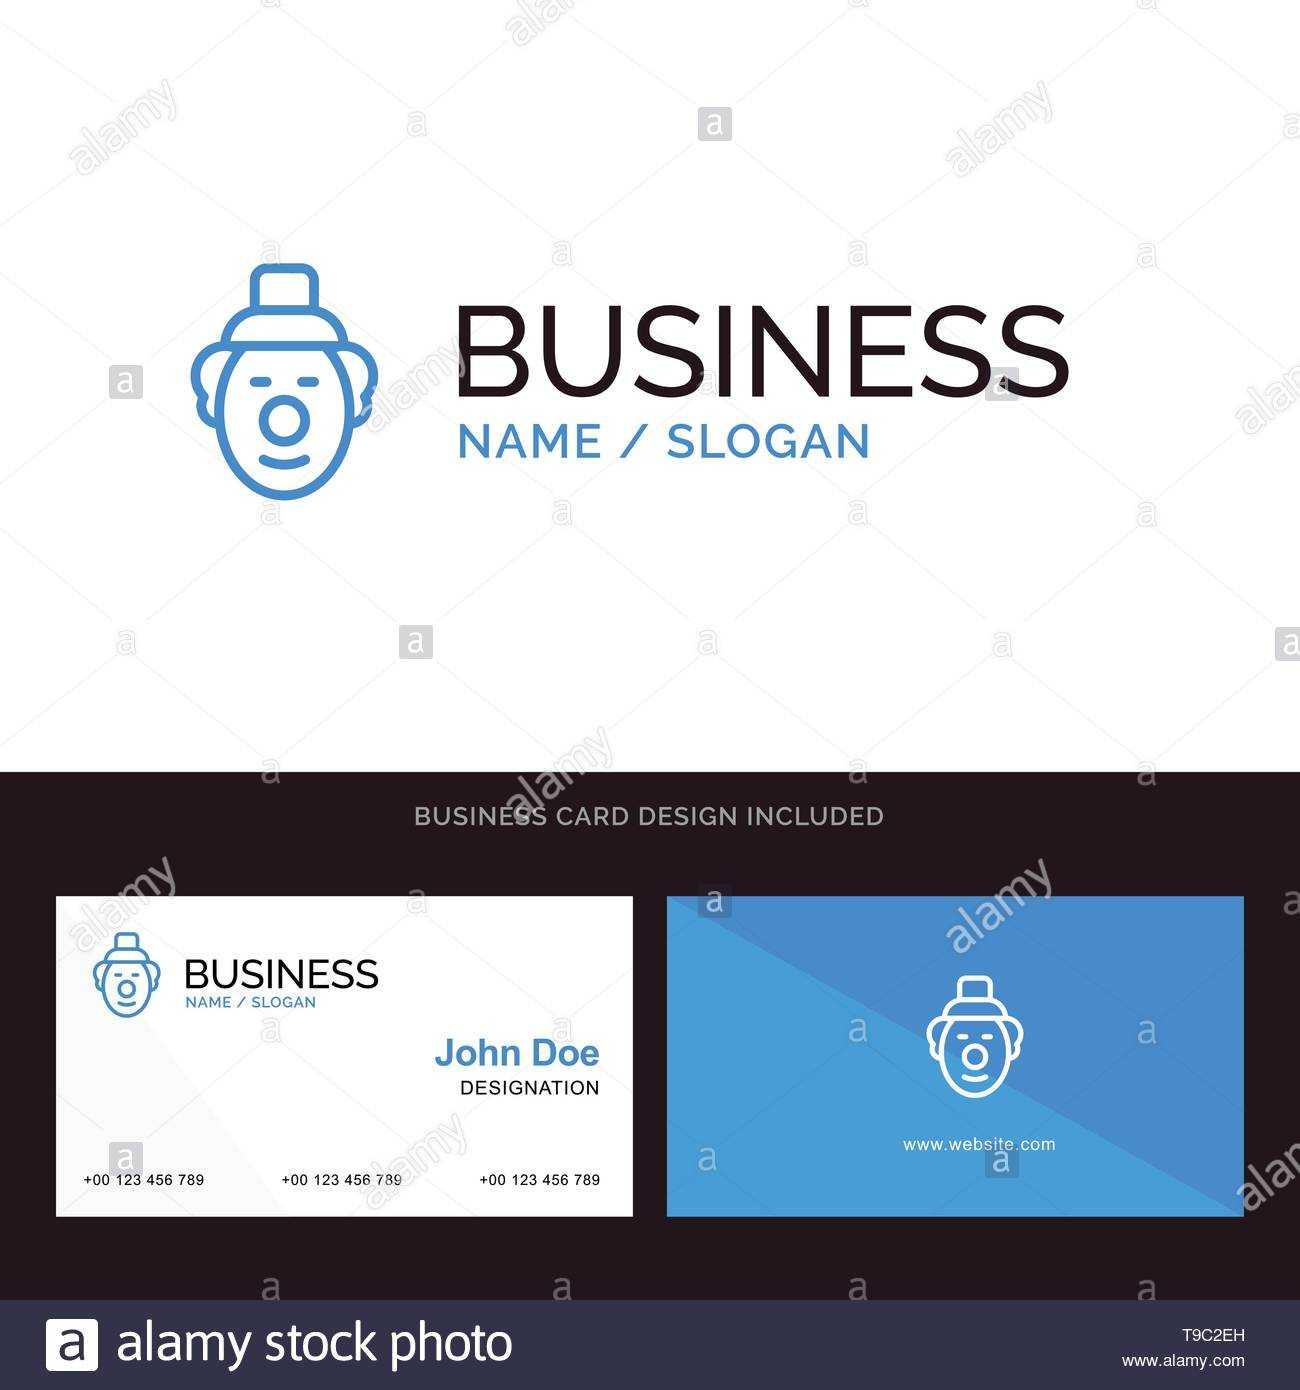 Logo And Business Card Template For Joker, Clown, Circus Within Joker Card Template